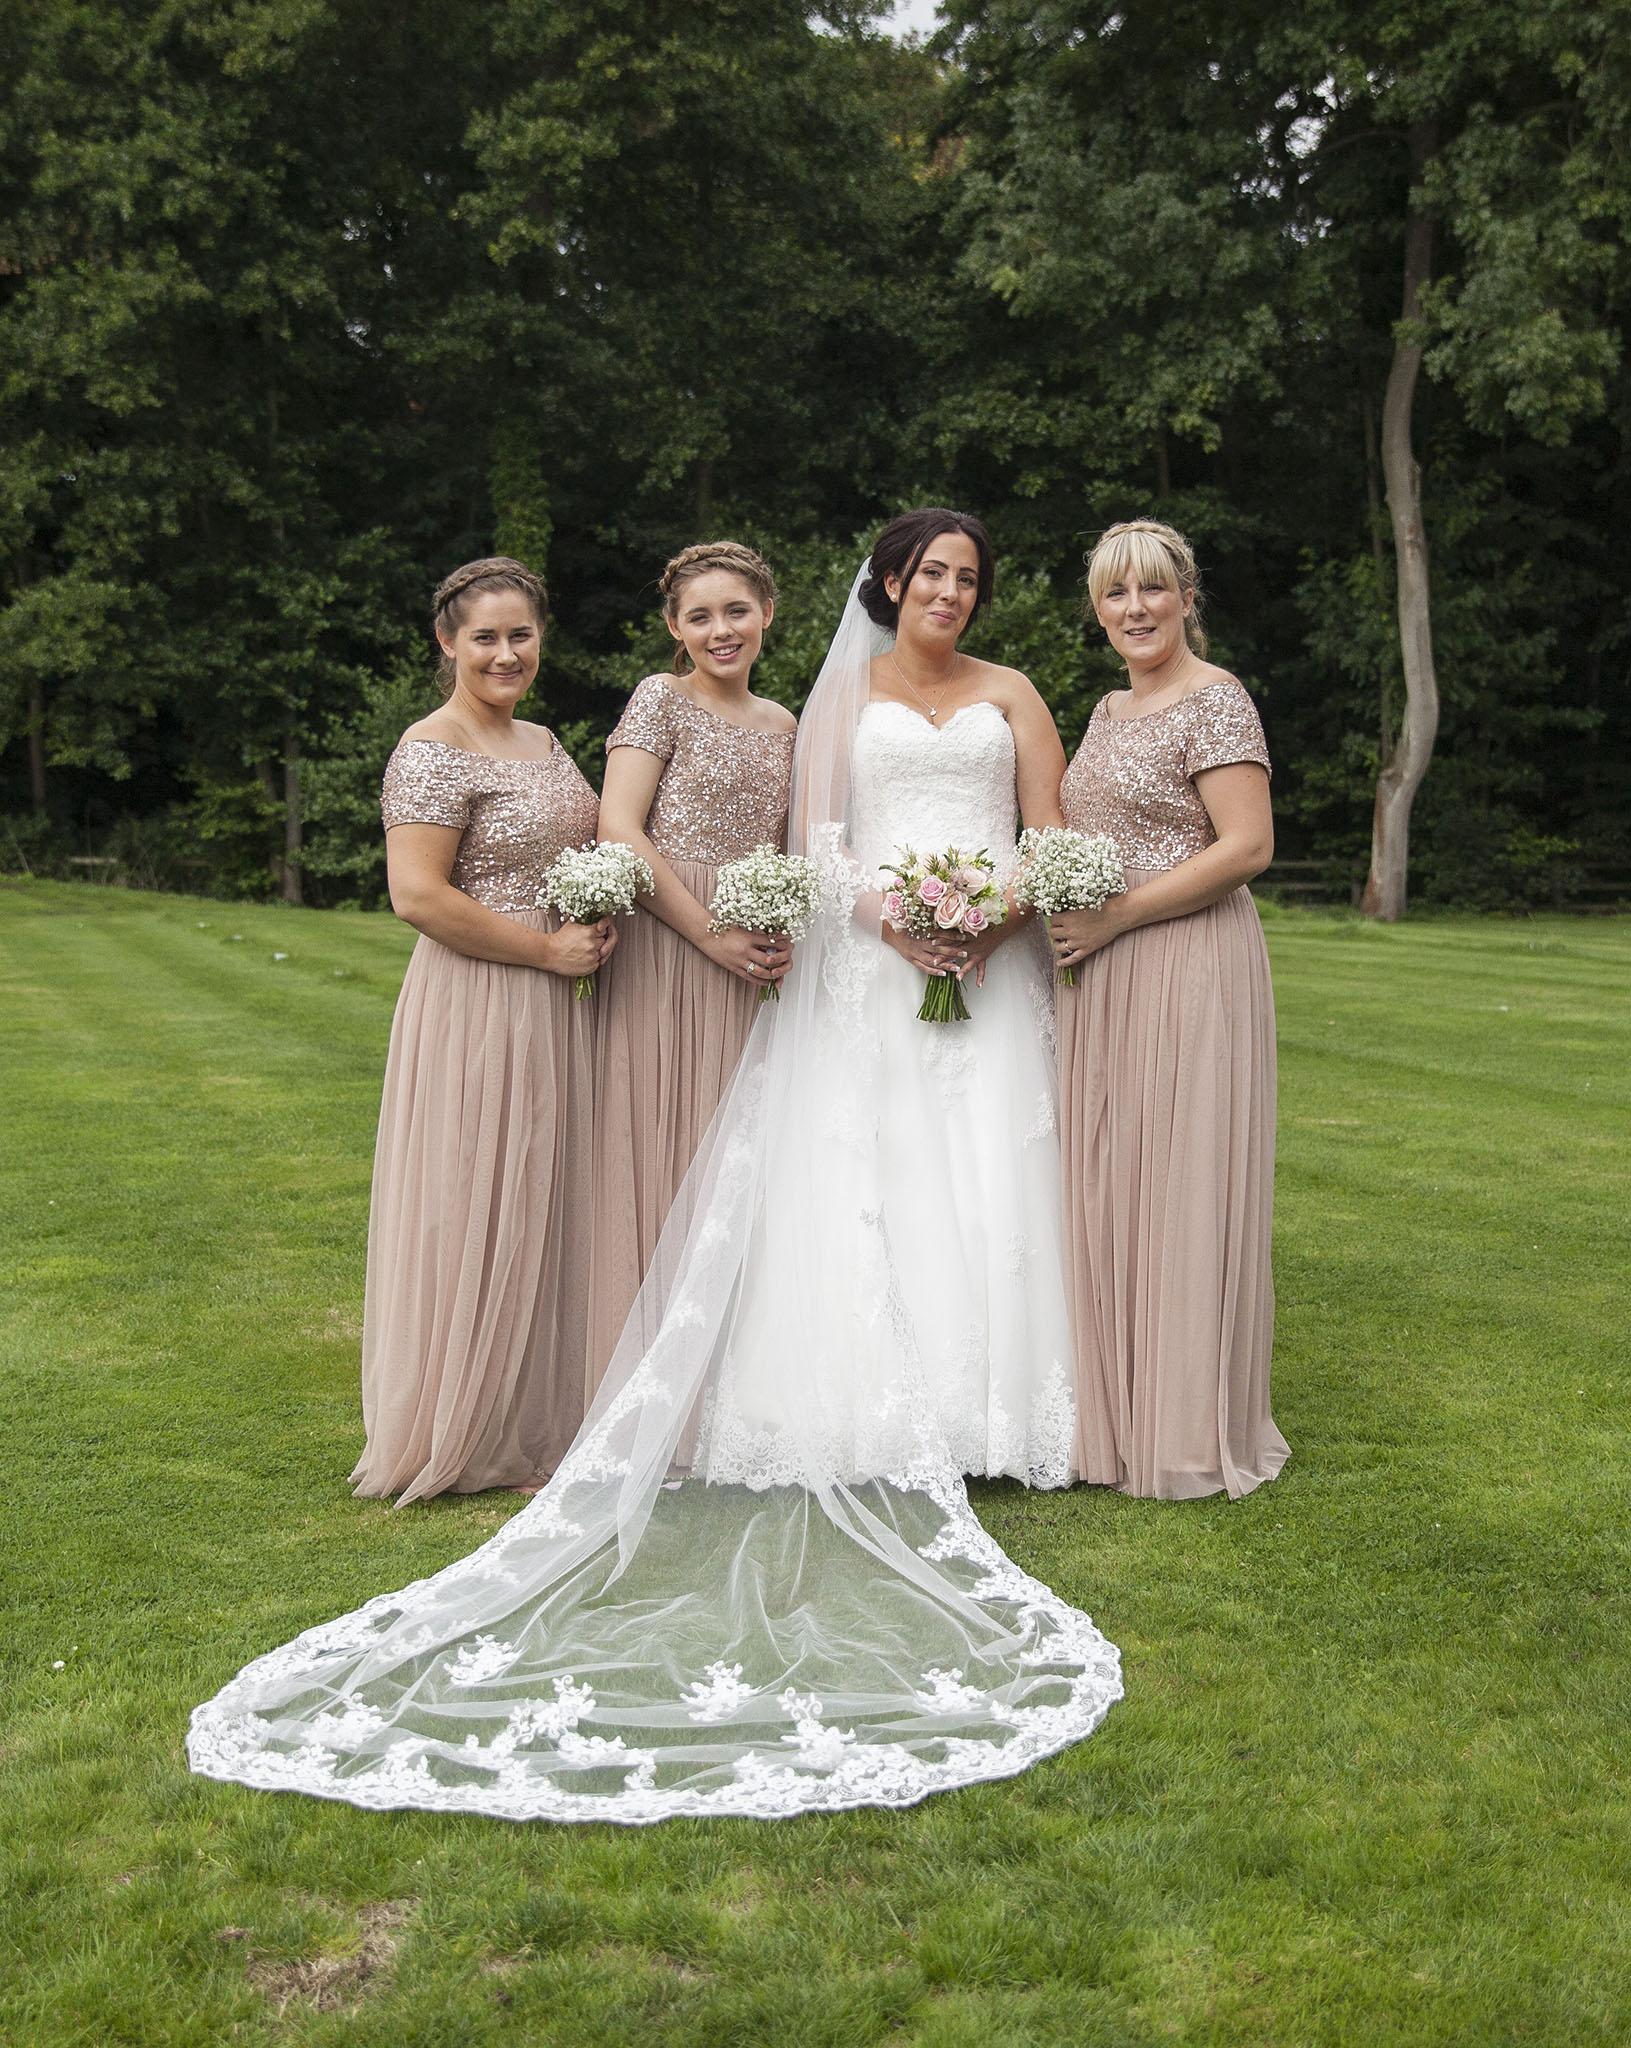 elizabethgphotography_kingslangley_hertfordshire_fineart_wedding_tewinbury_farm_tayna_14.jpg